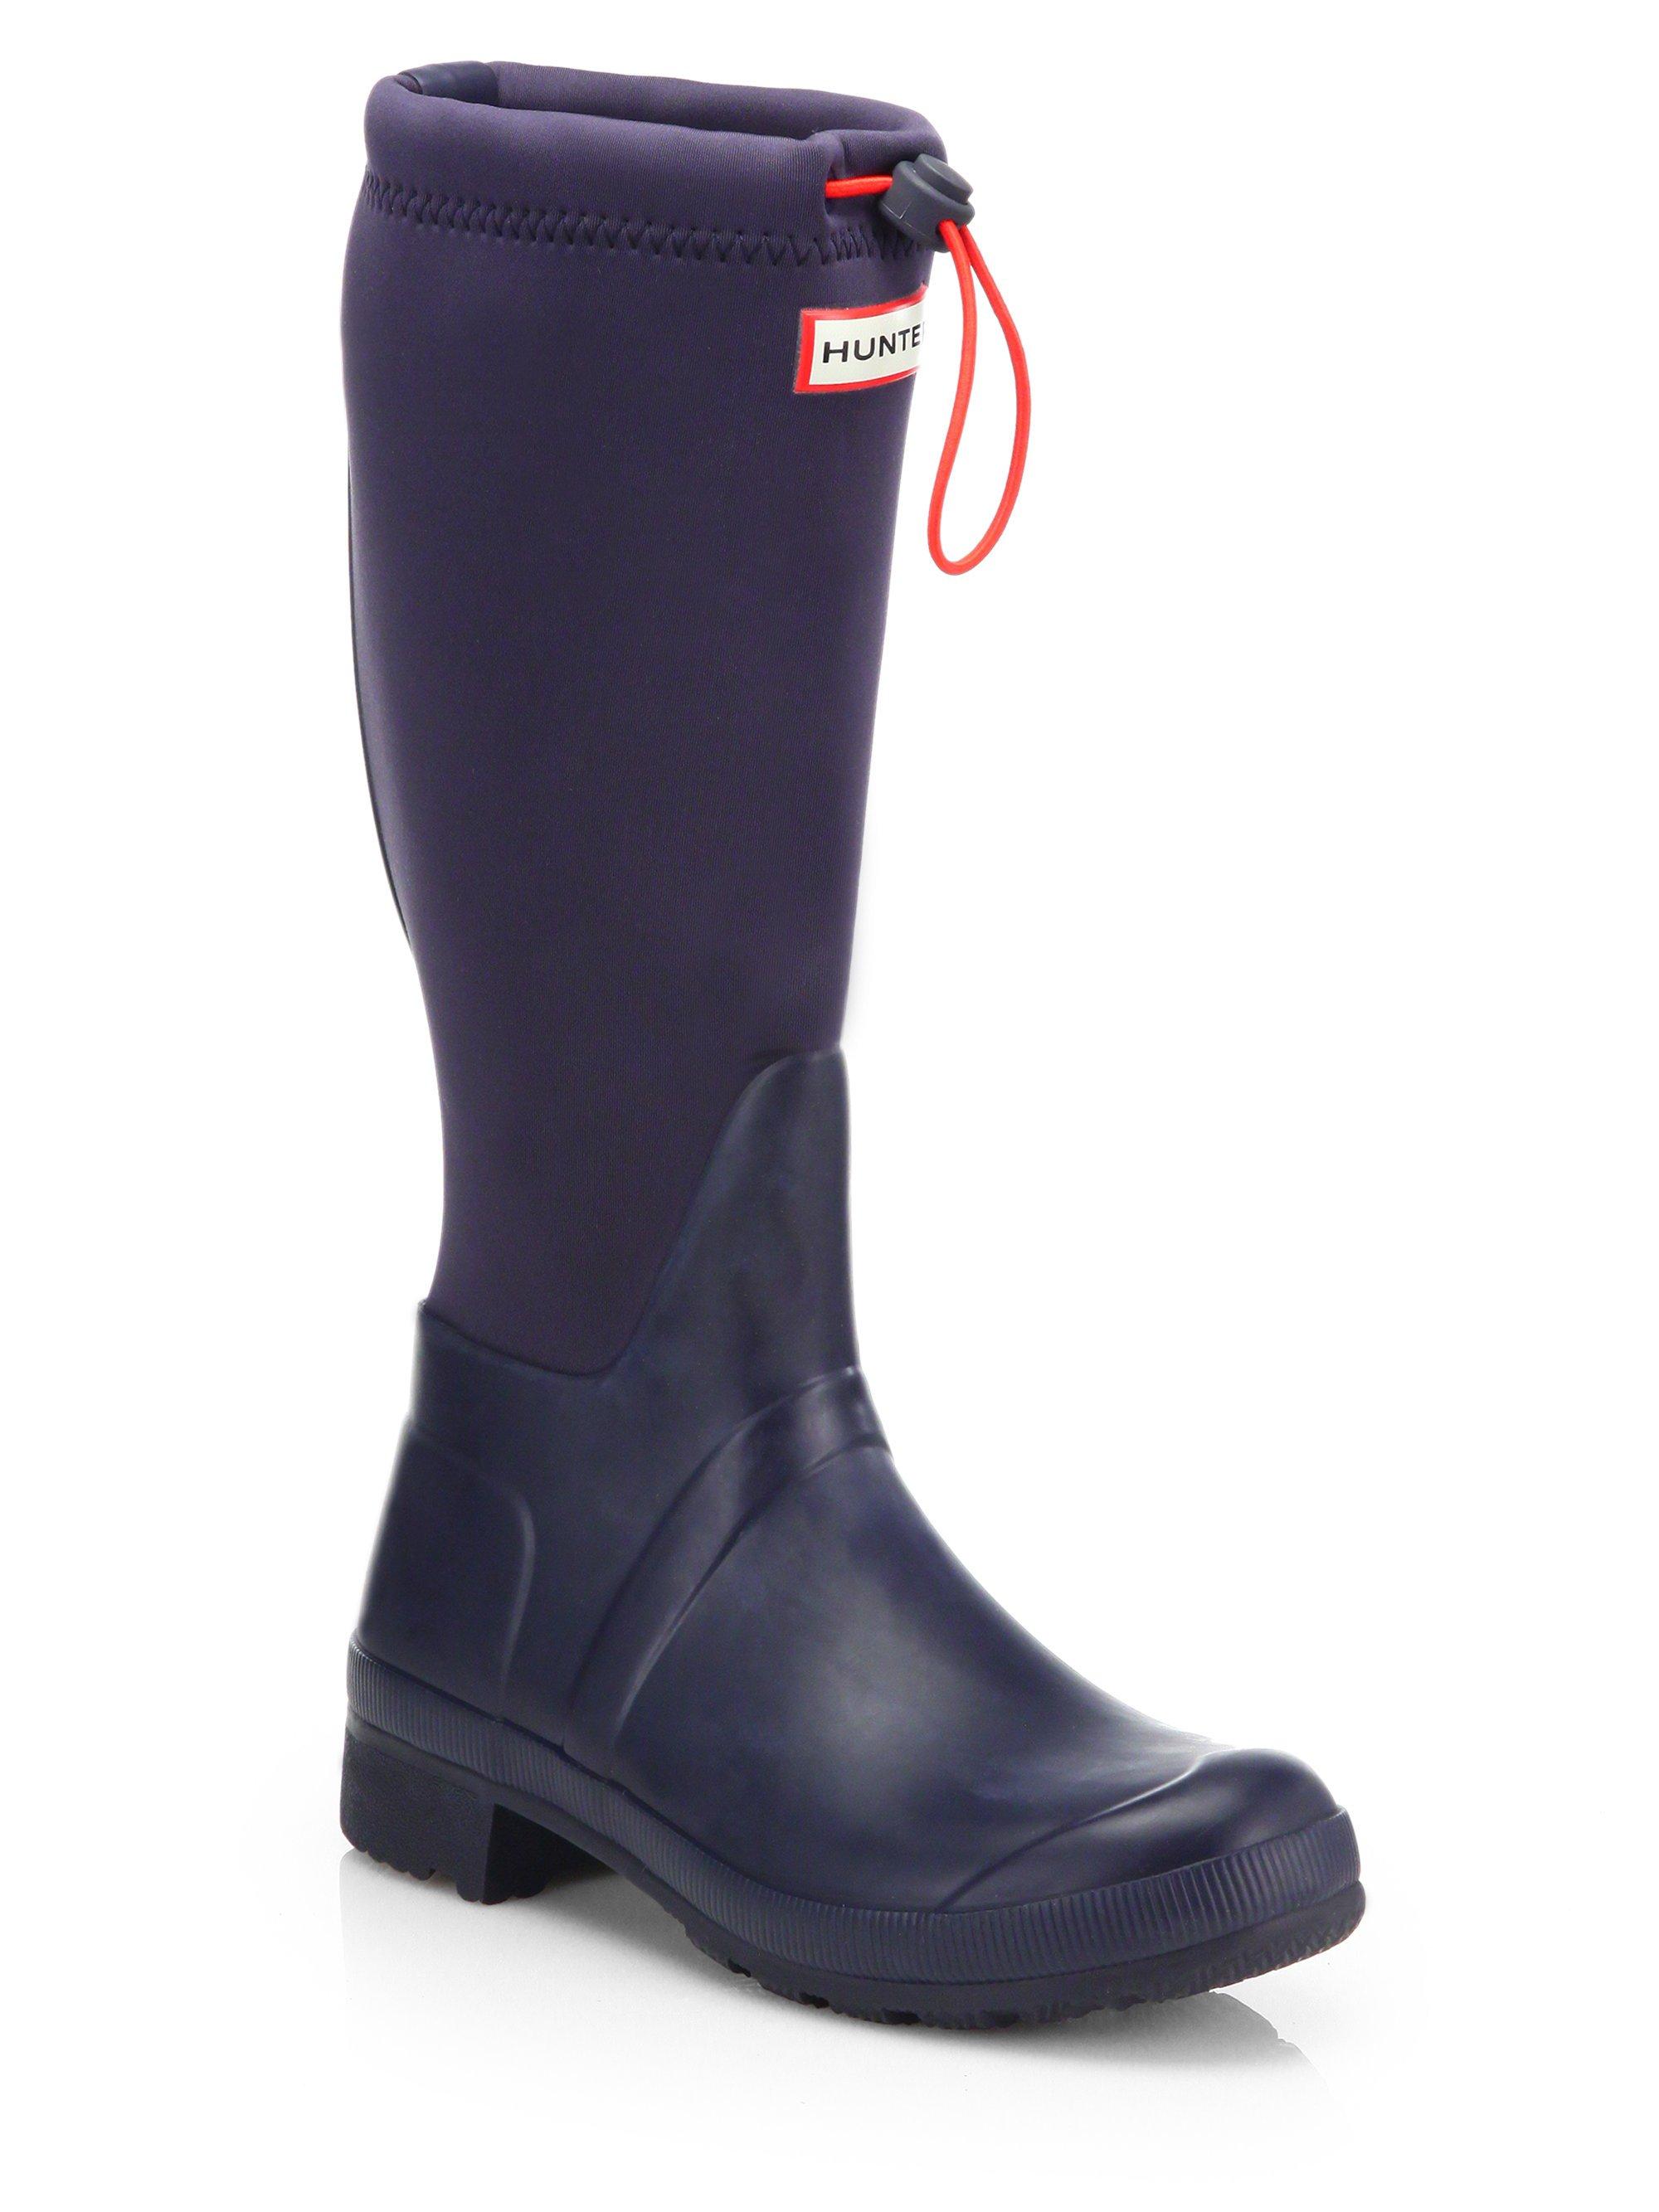 Hunter Original Tour Neoprene & Rubber Rain Boots in Blue | Lyst